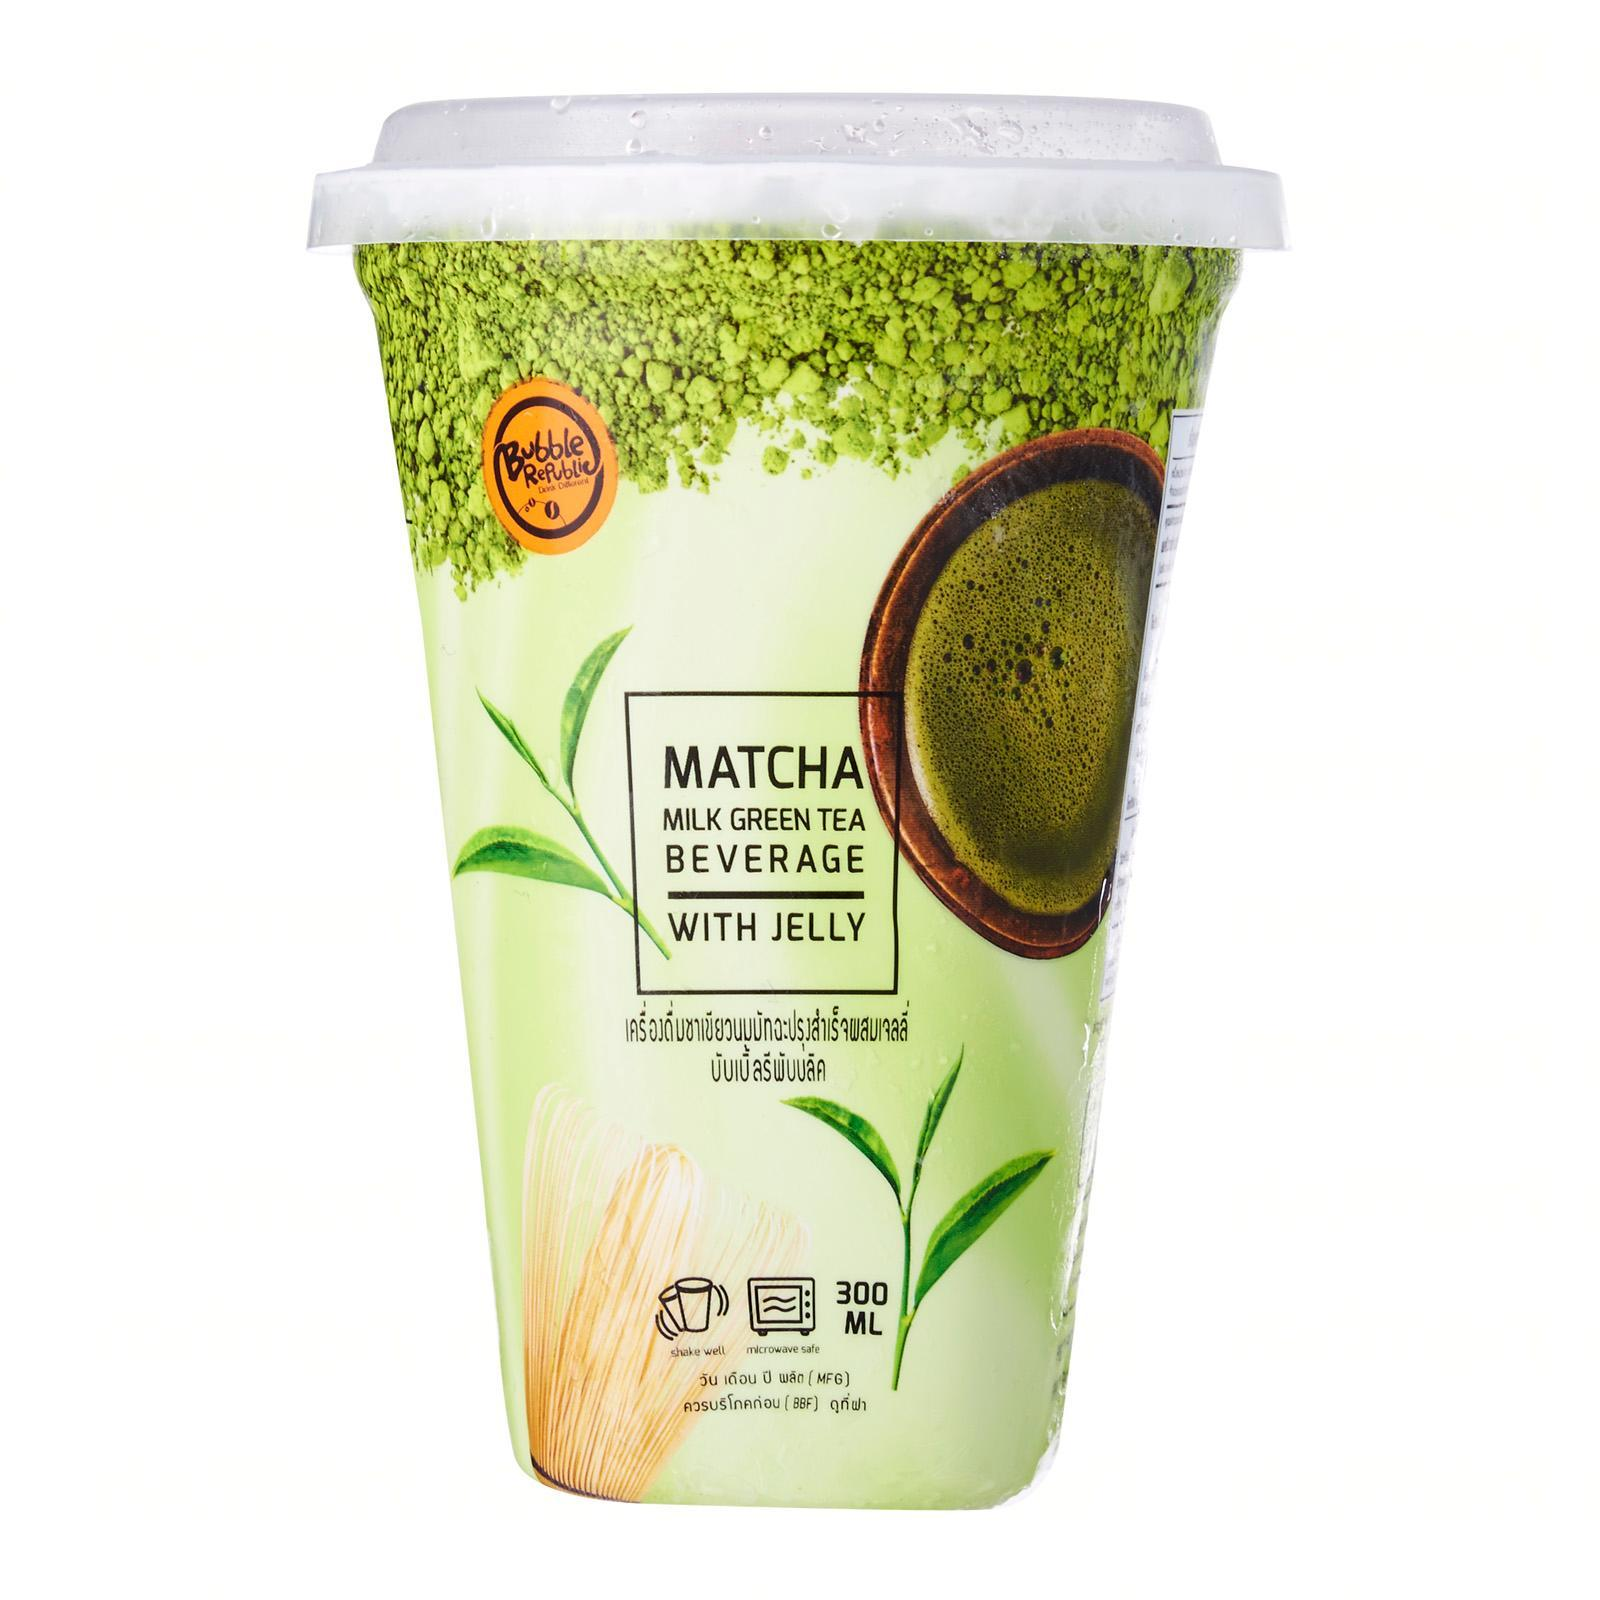 Bubble Republic Matcha Latte With Jelly - Frozen